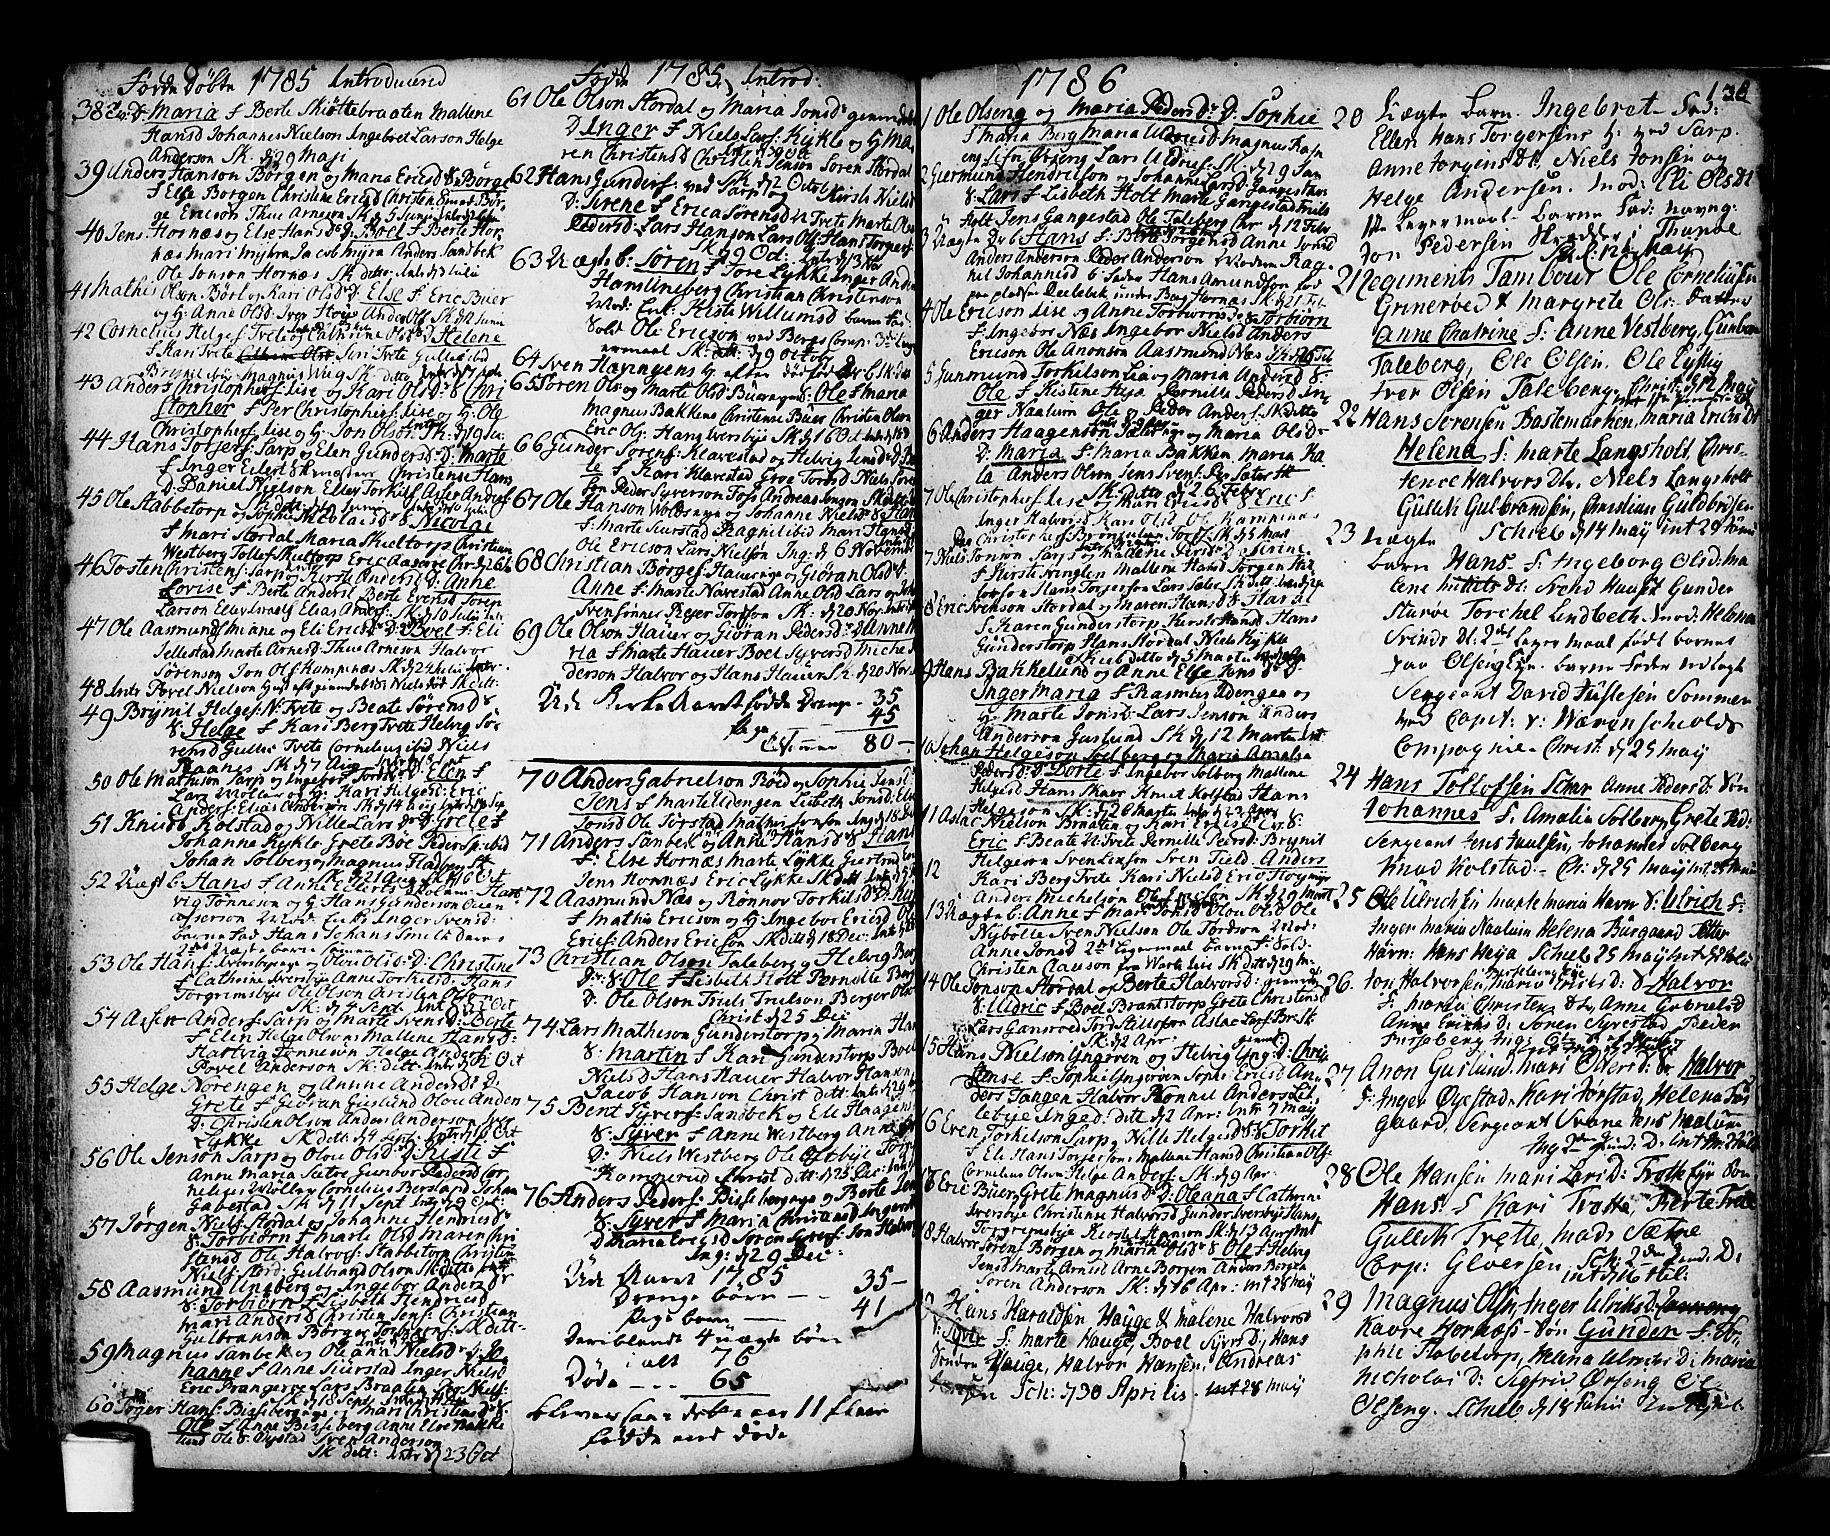 SAO, Skjeberg prestekontor Kirkebøker, F/Fa/L0002: Parish register (official) no. I 2, 1726-1791, p. 138